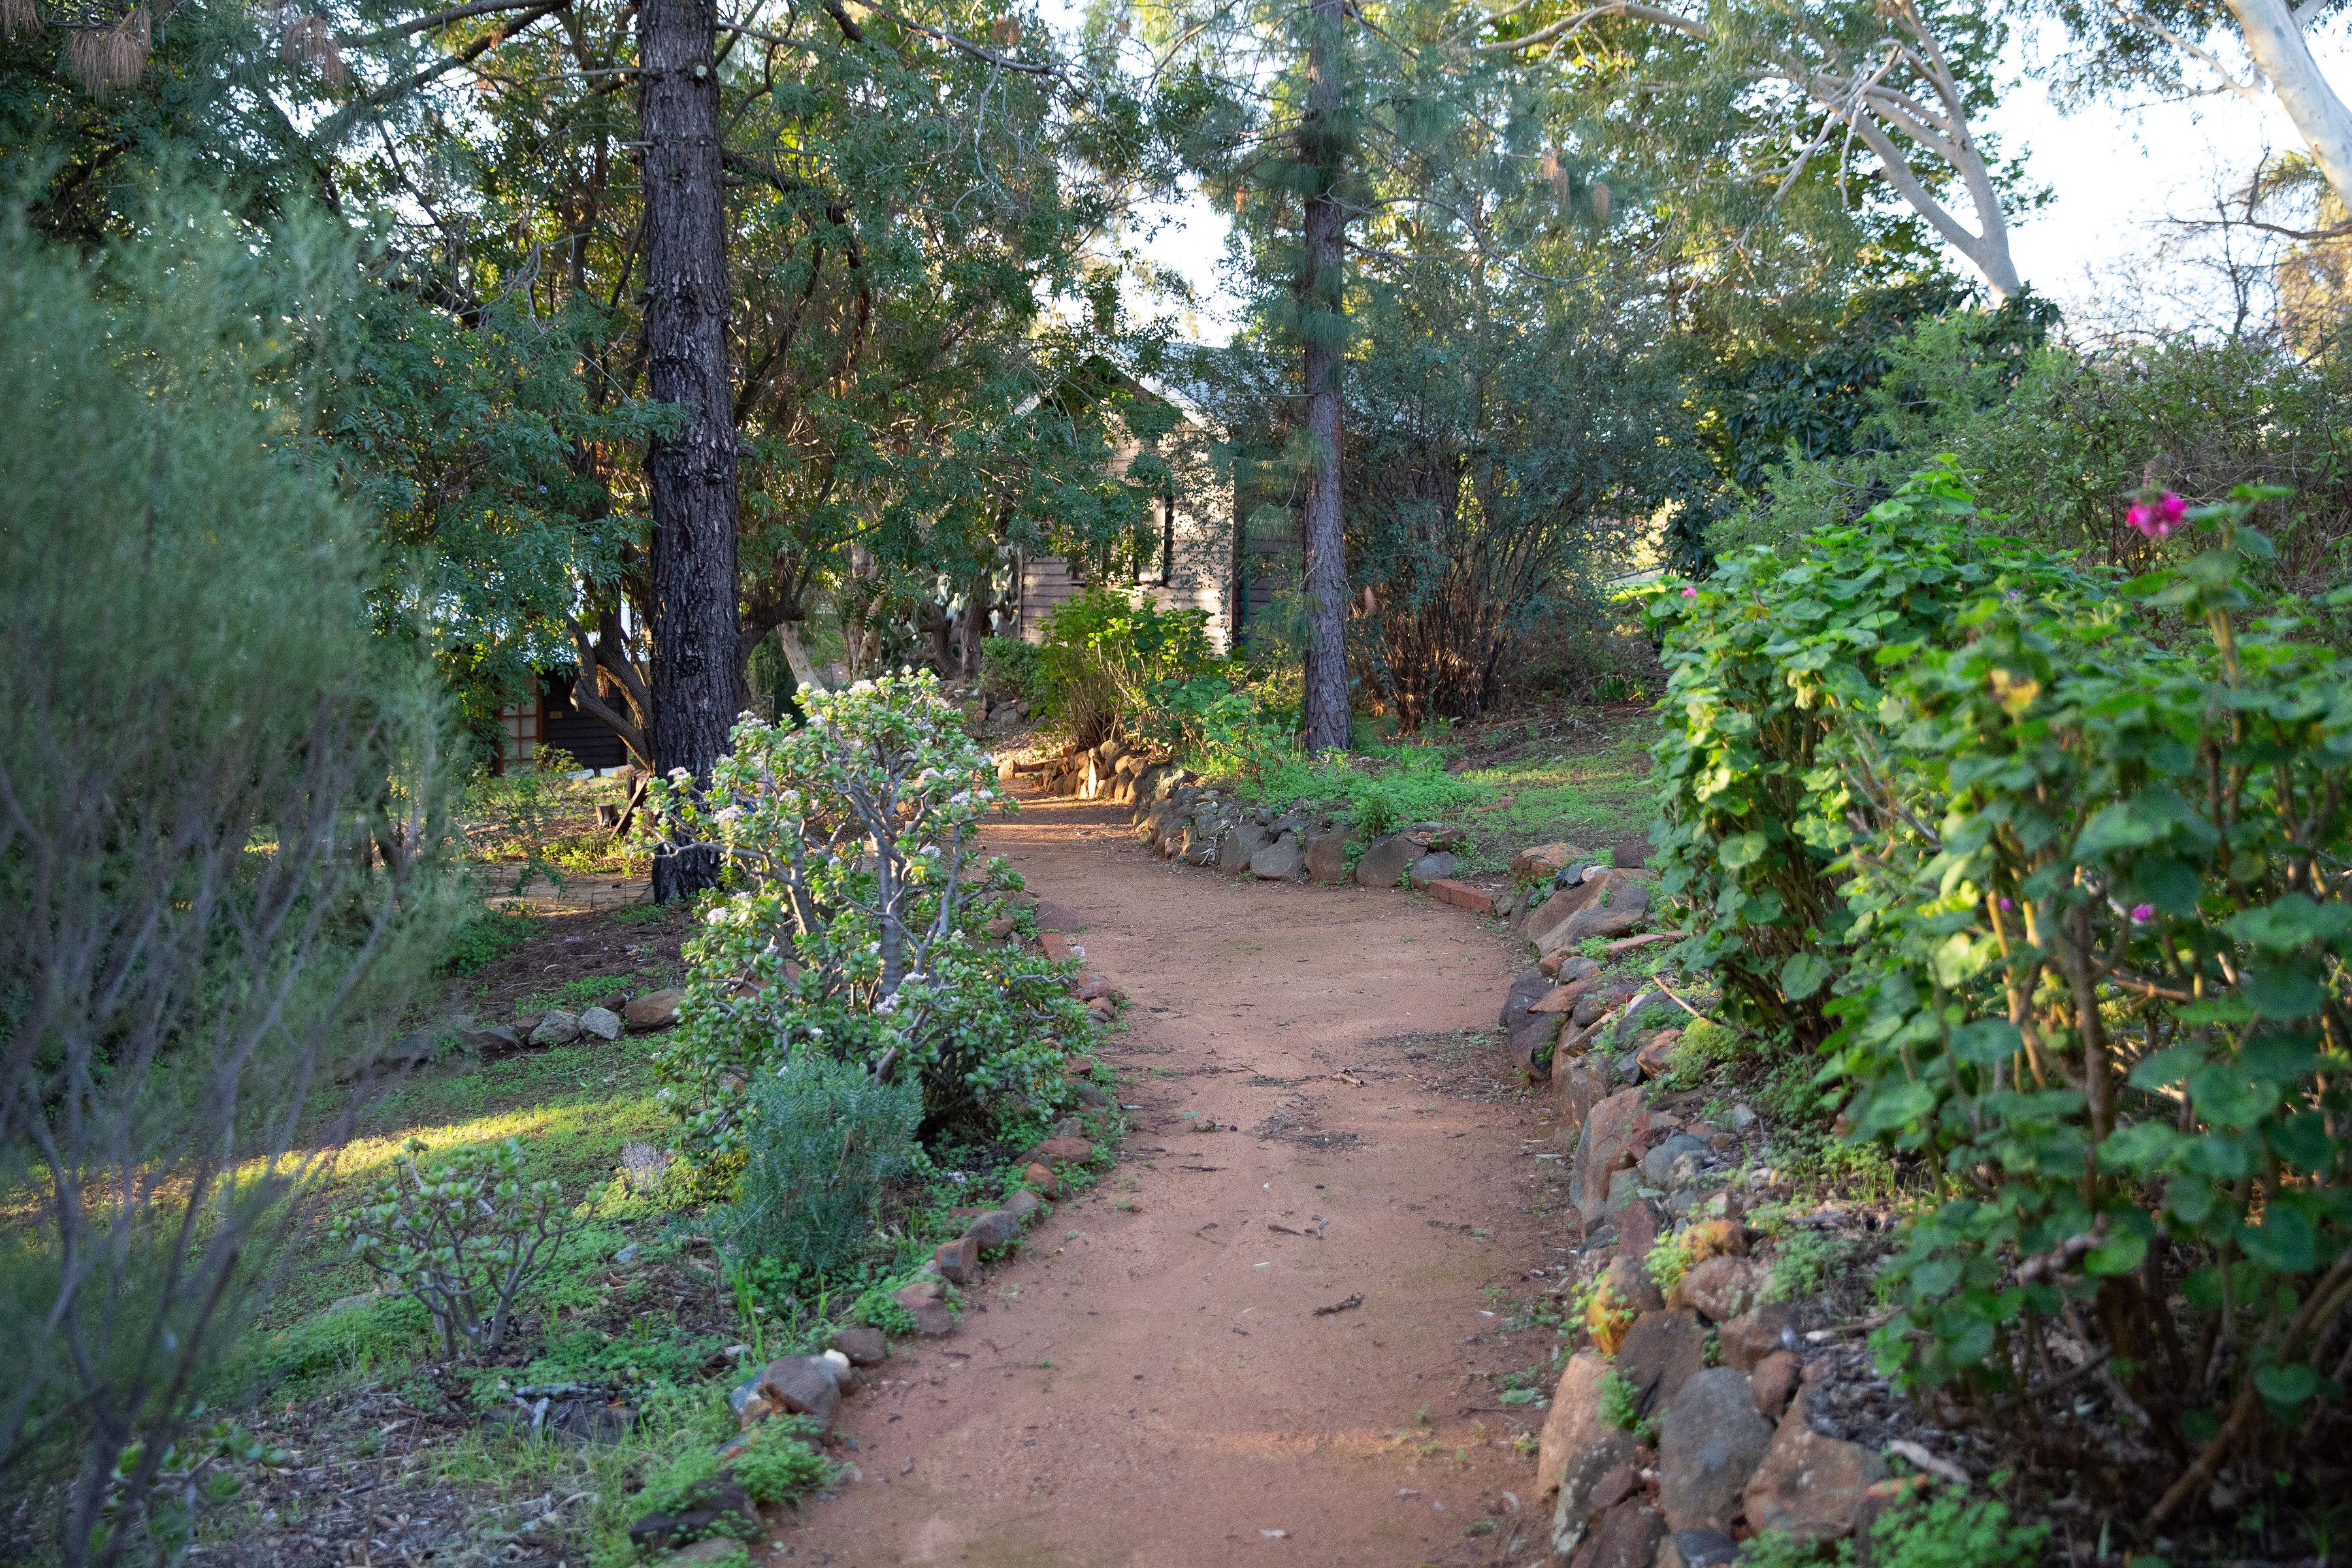 Winding path to writing